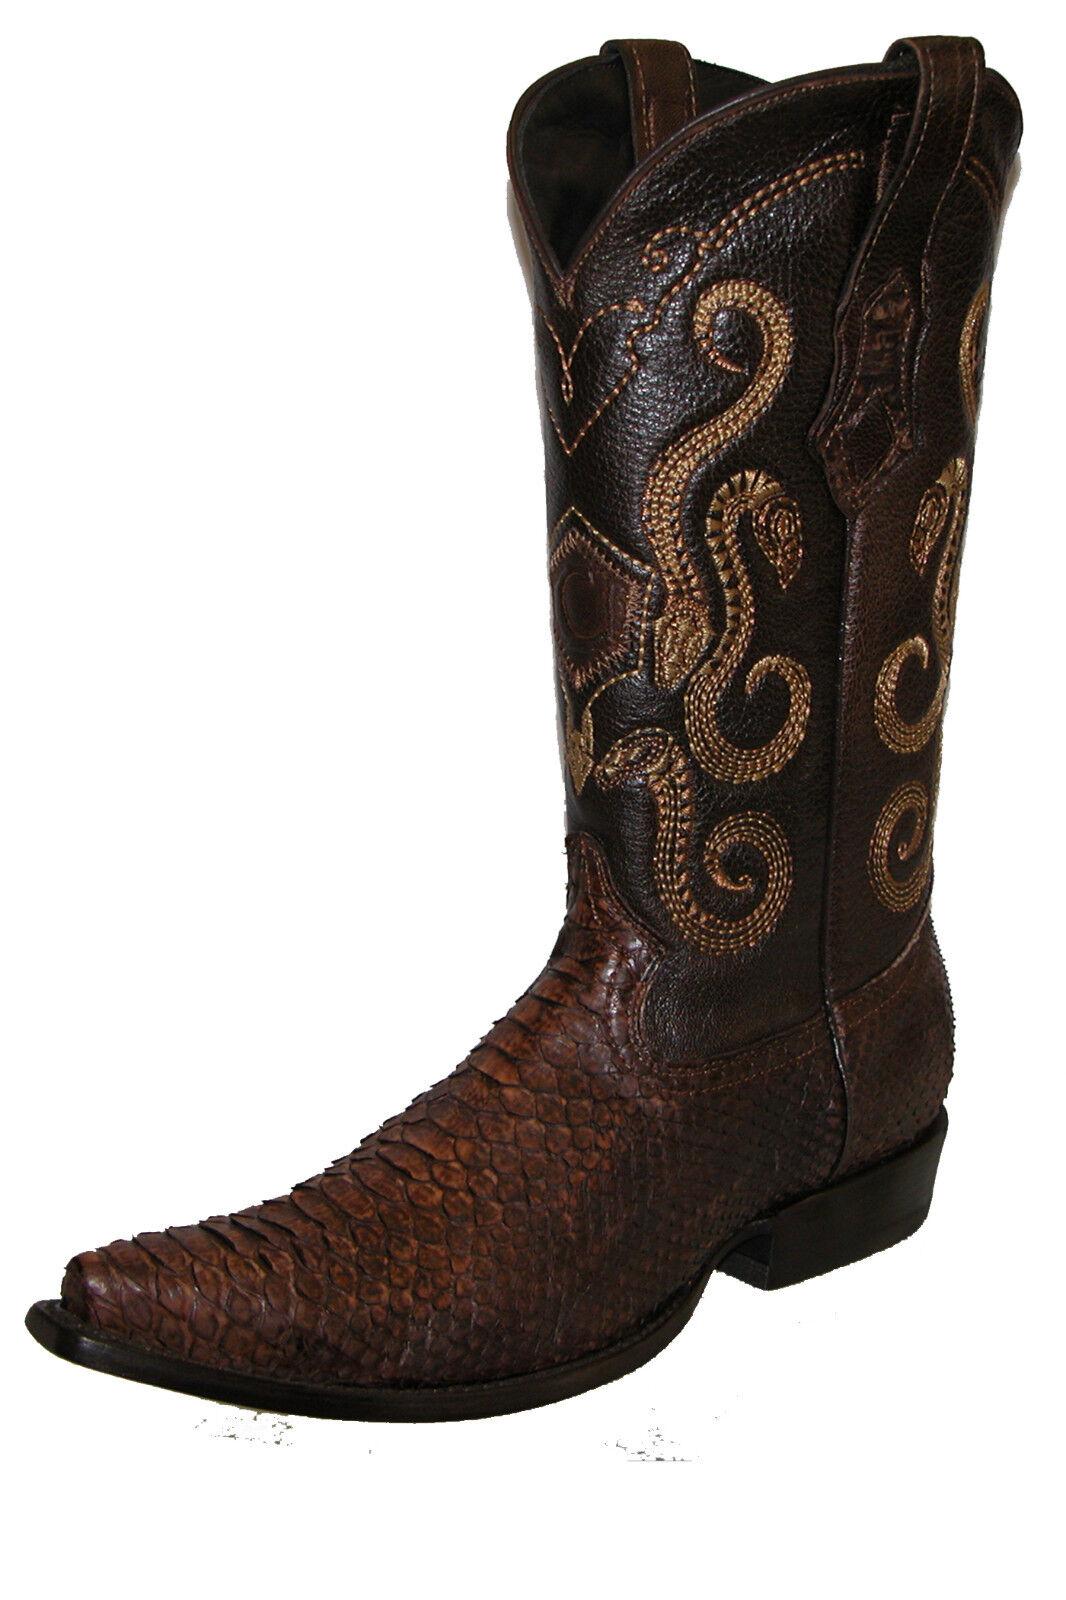 Genuine Python Traditional Western Stivali made by Cuadra boots